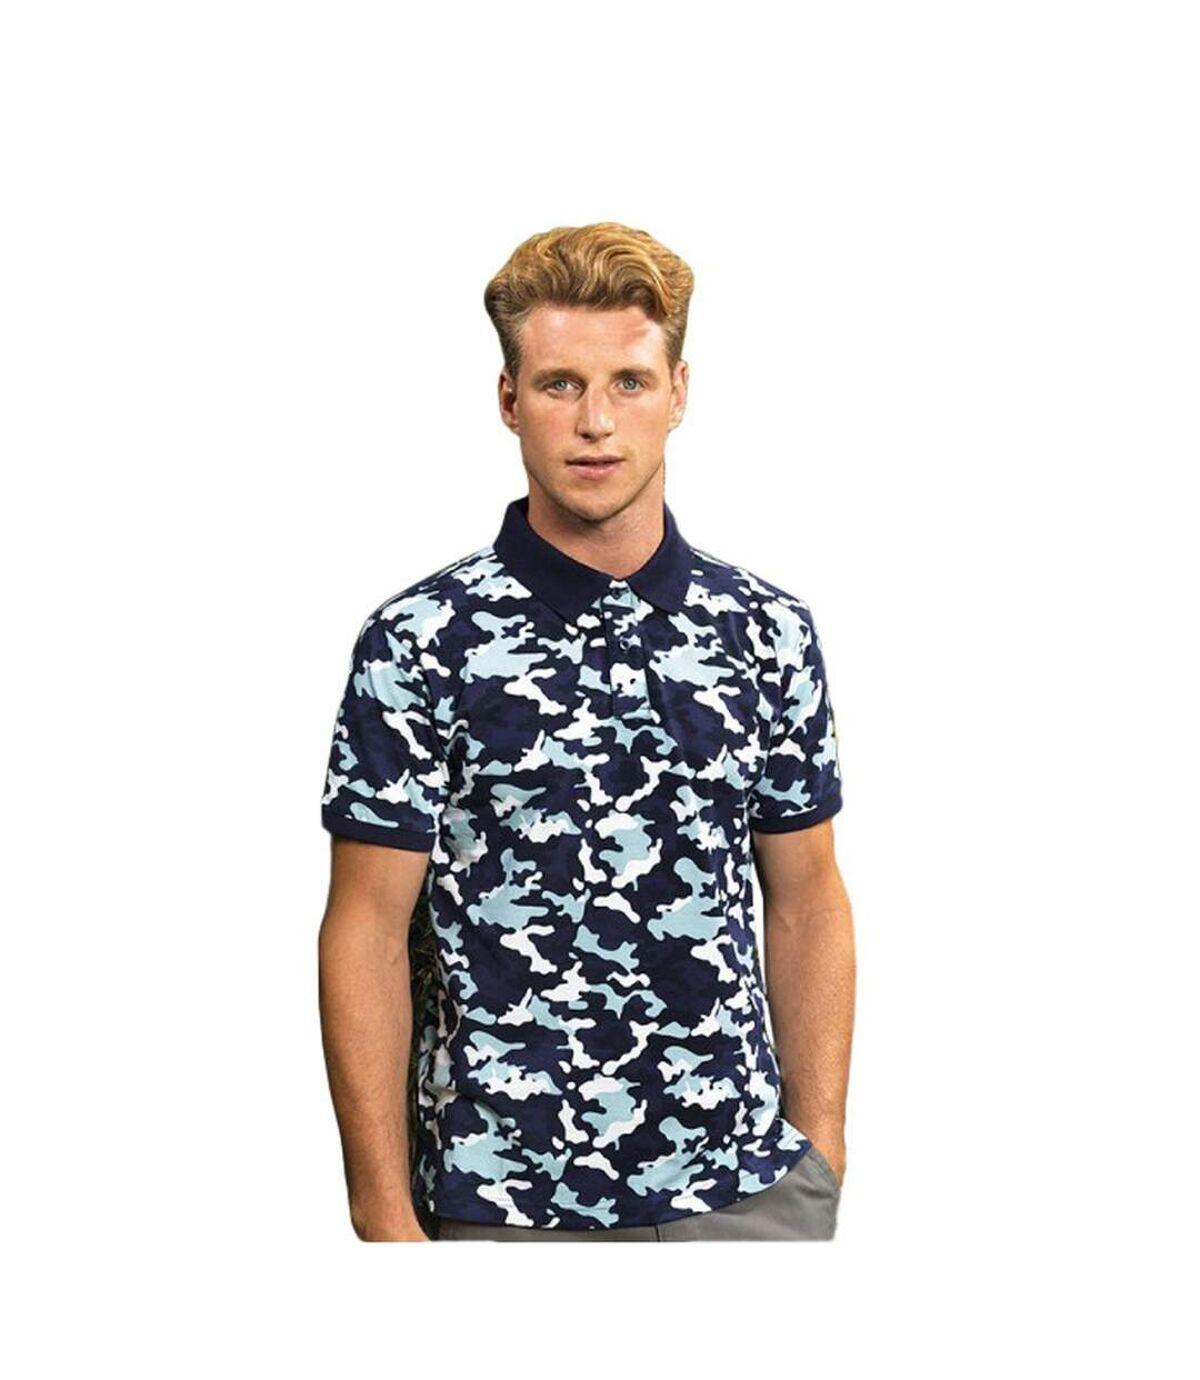 Asquith & Fox Mens Short Sleeve Camo Print Polo Shirt (Camo Blue) - UTRW5351